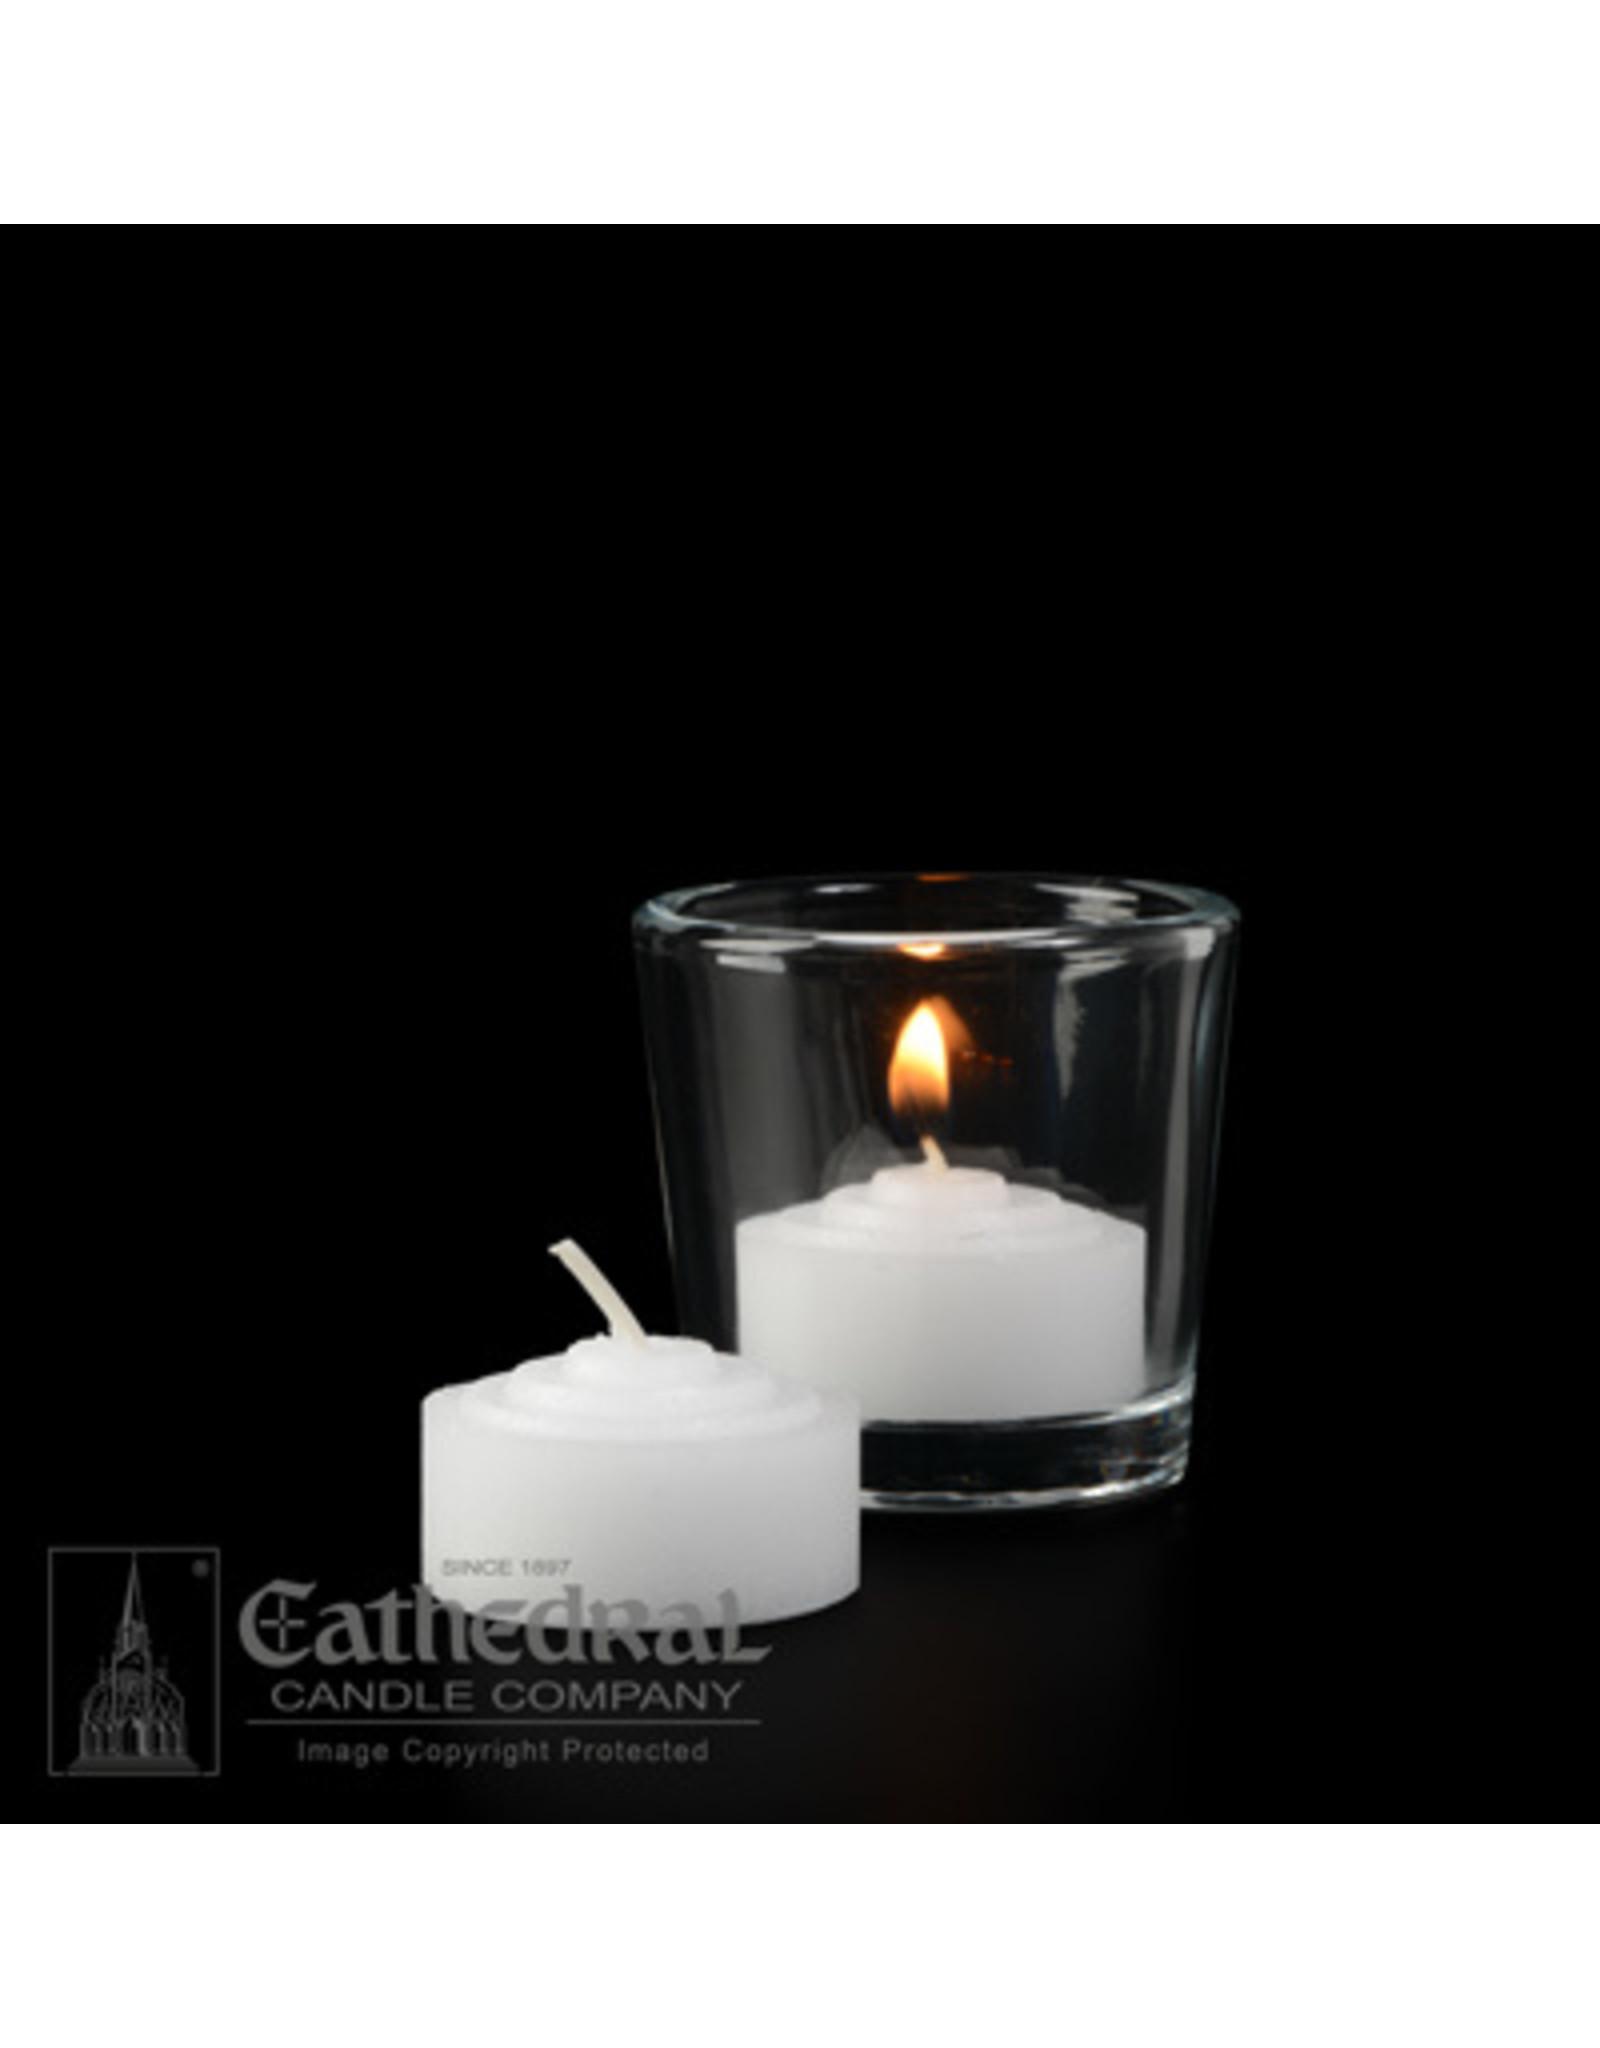 4-Hour Votive Candles (4 Gross)